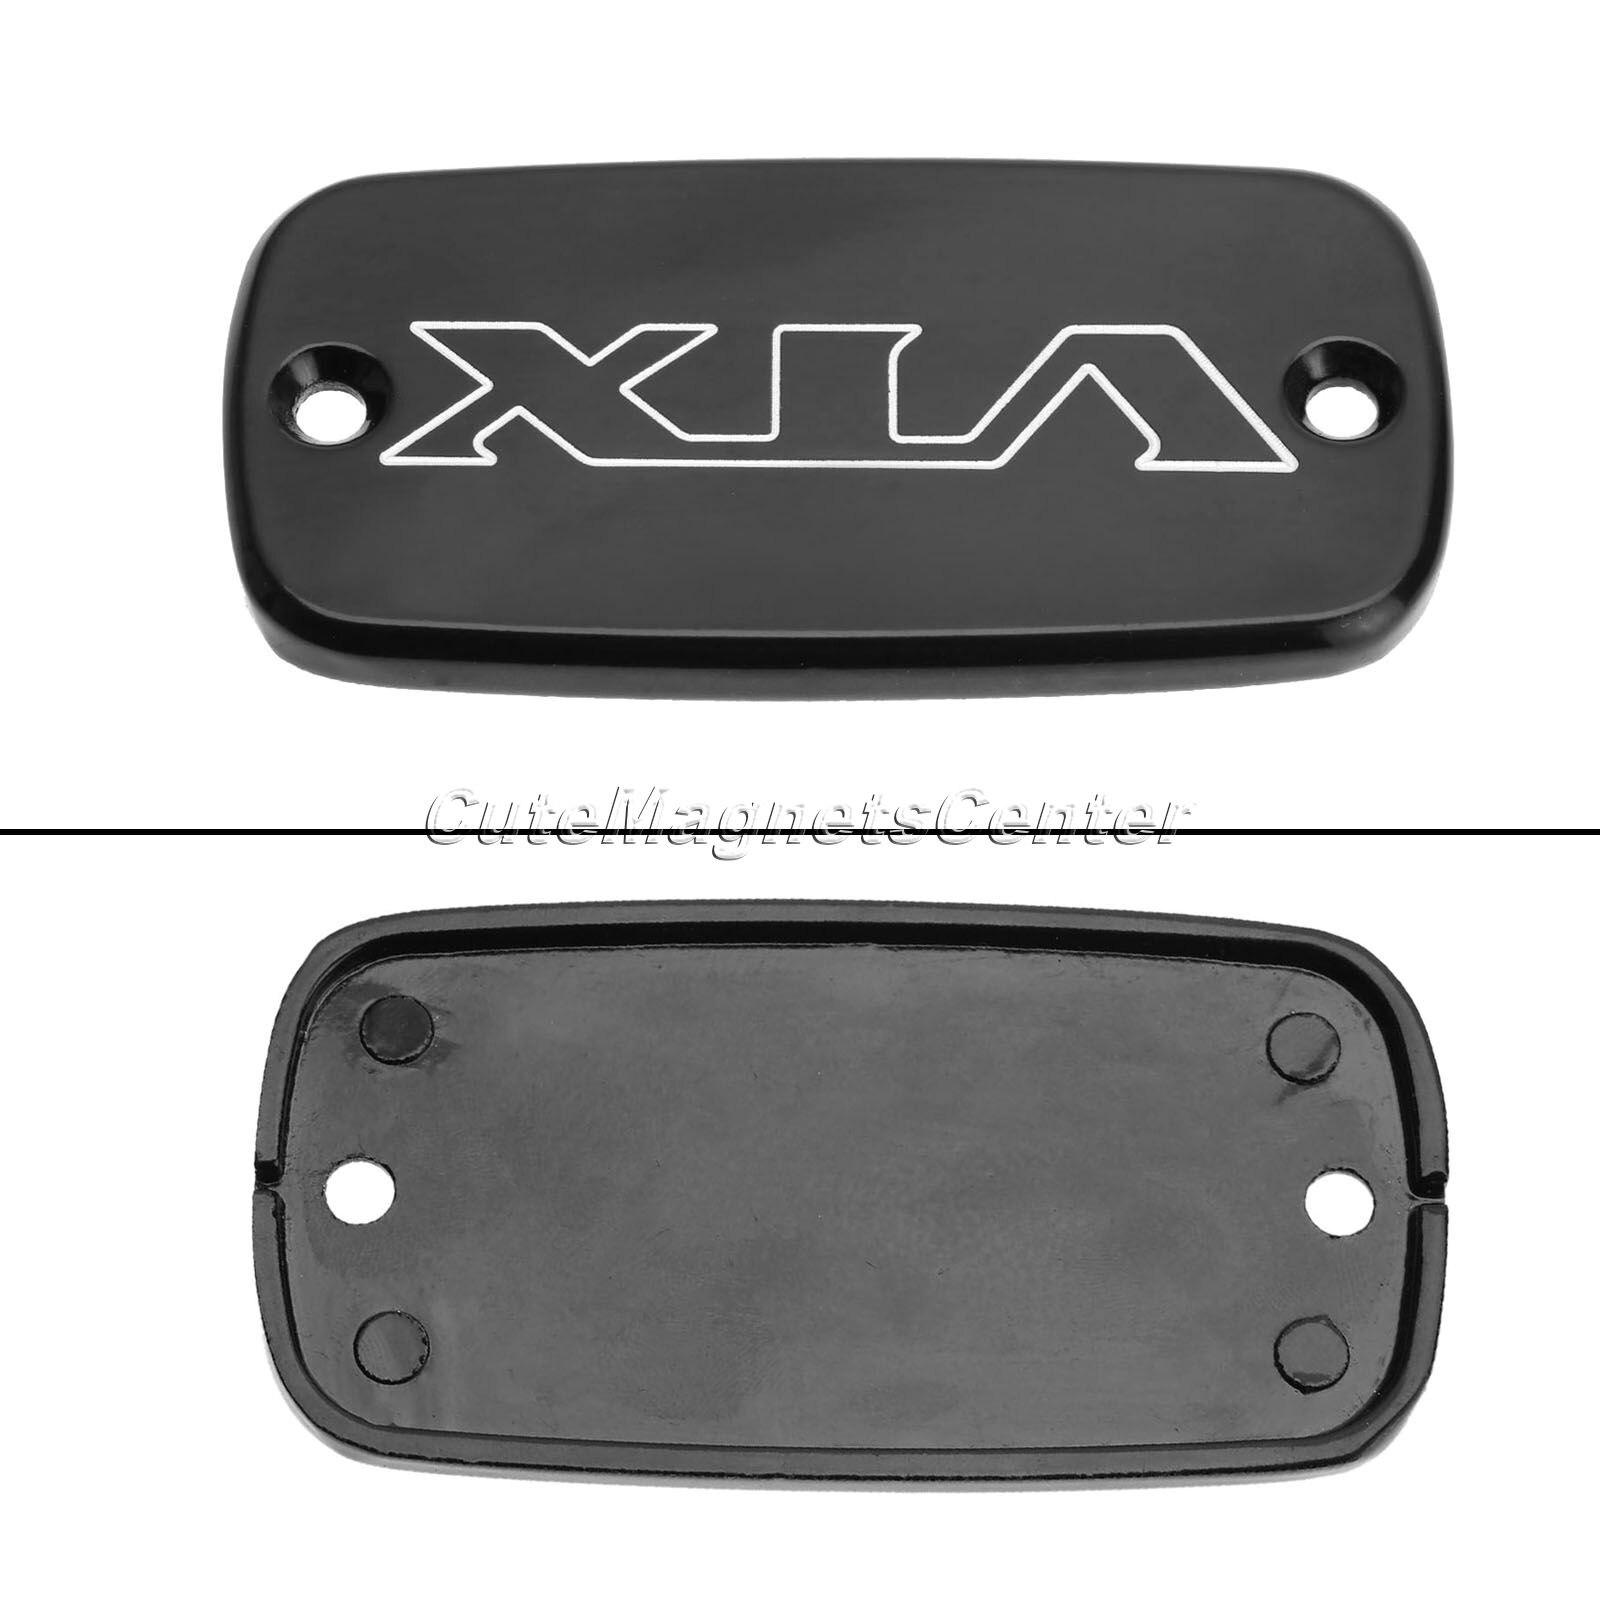 Honda motorcycles logo - 1pc Black Motorcycle Brake Fluid Reservoir Cap For Honda Vtx 1800 2002 2011 Aluminum Engraved